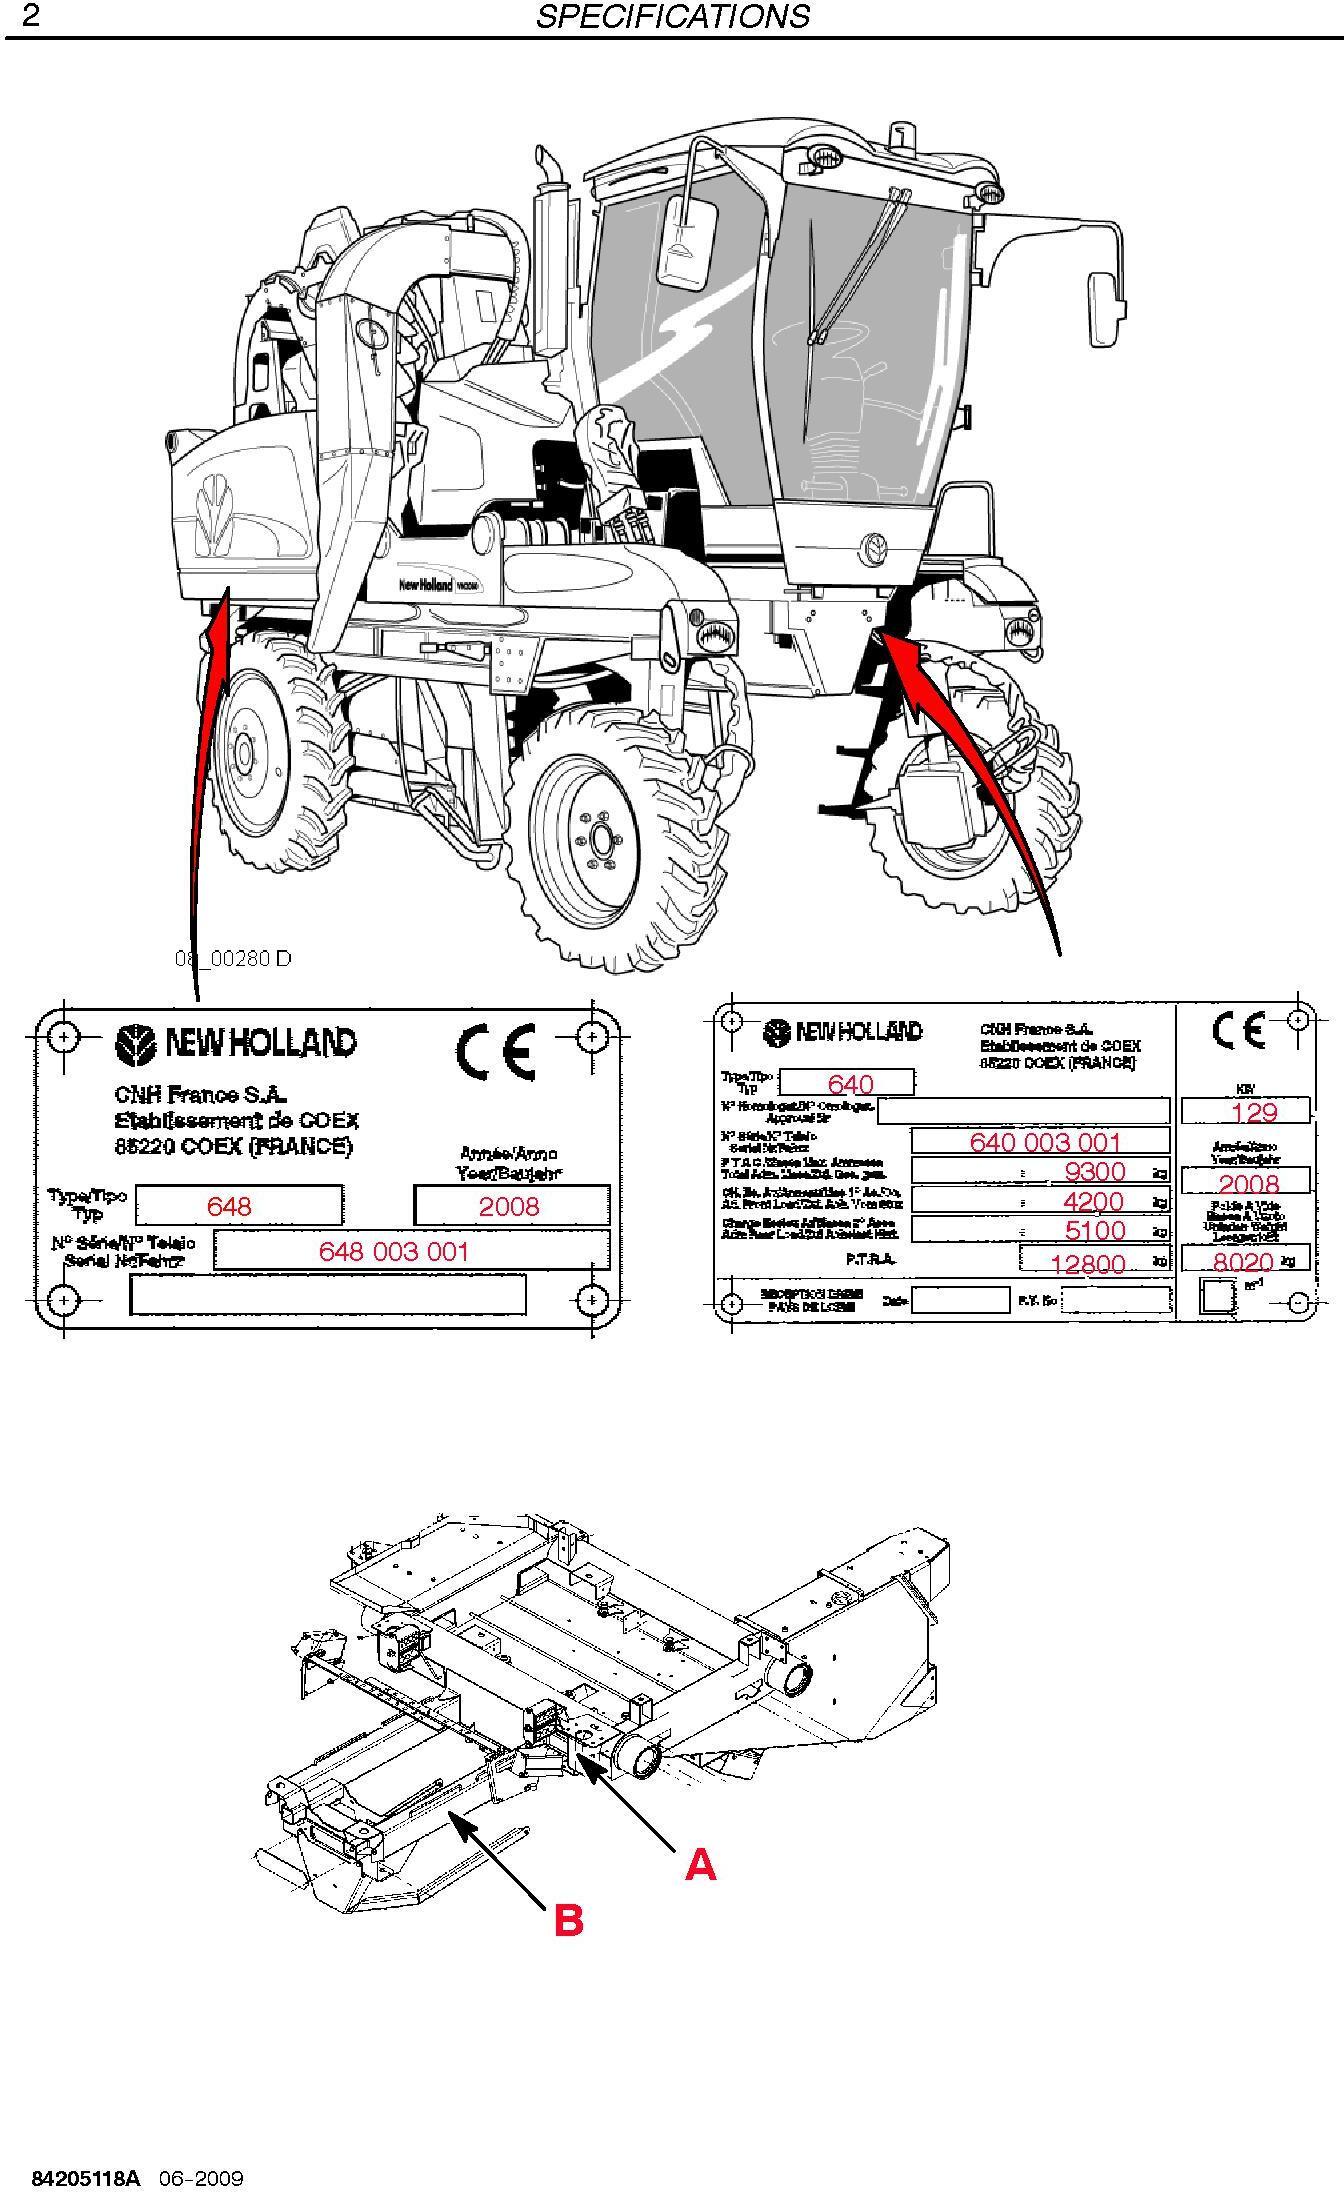 New Holland VN2080 Grape Harvester Service Manual - 1